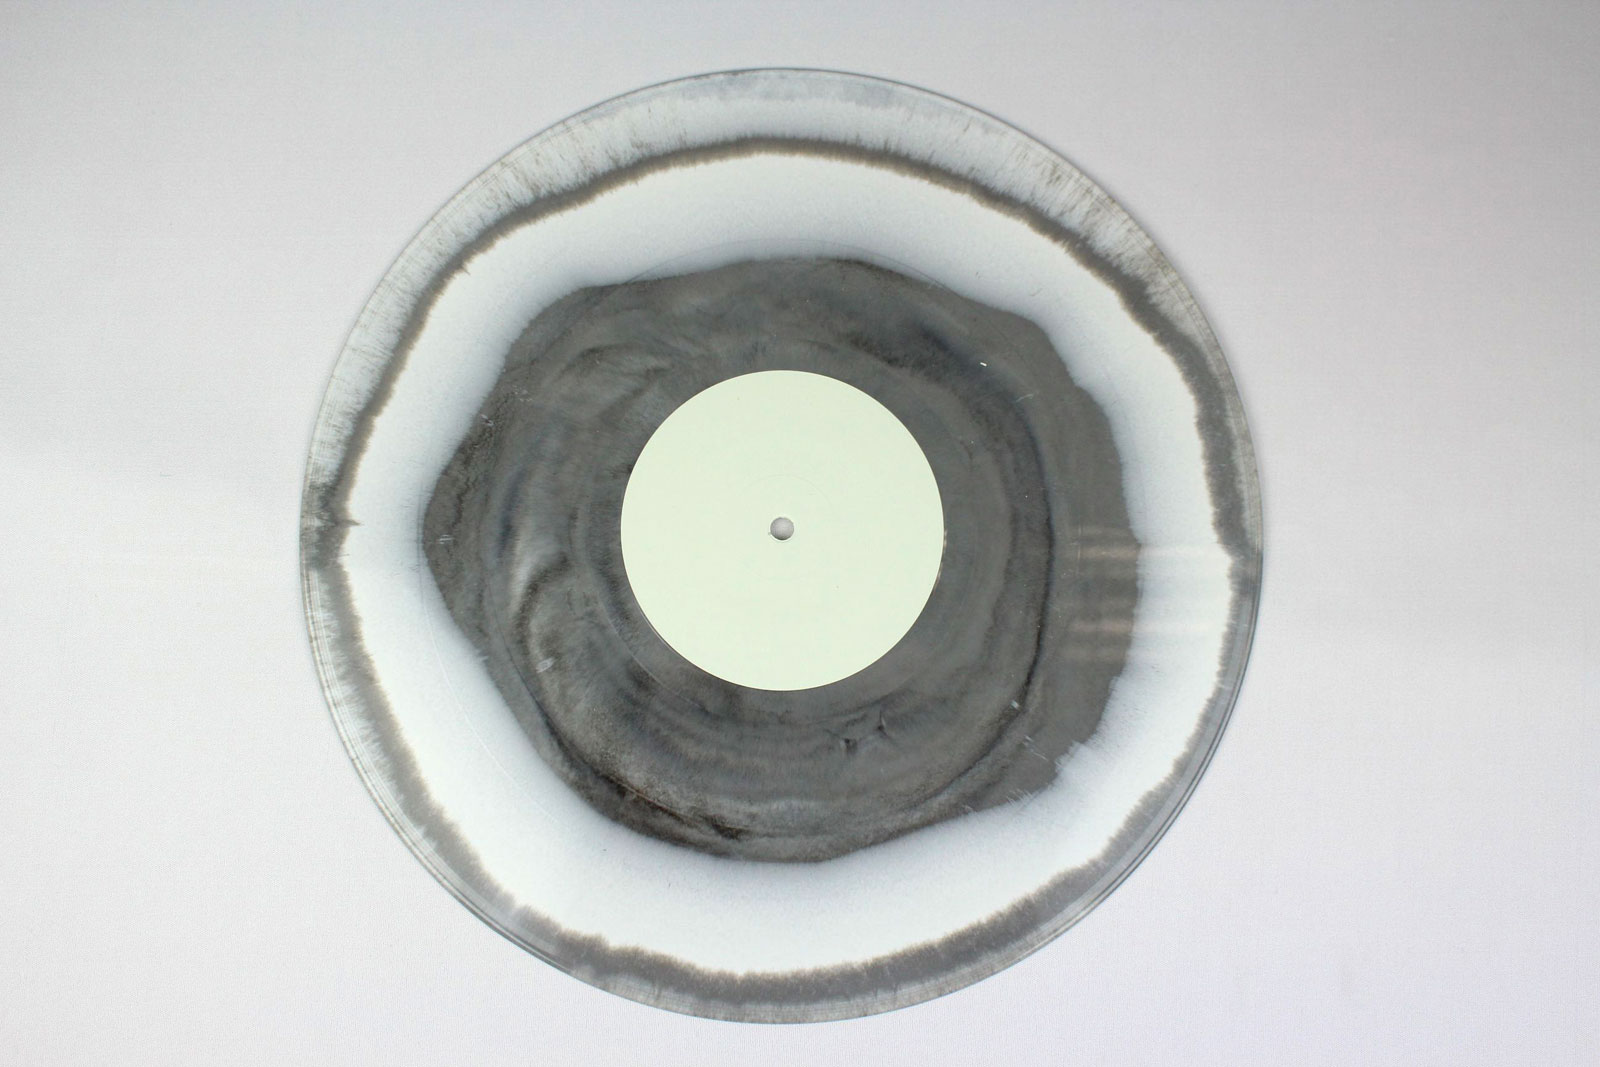 Side A: 90 % white + 10 % black / Side B: 70% white + 30% clear